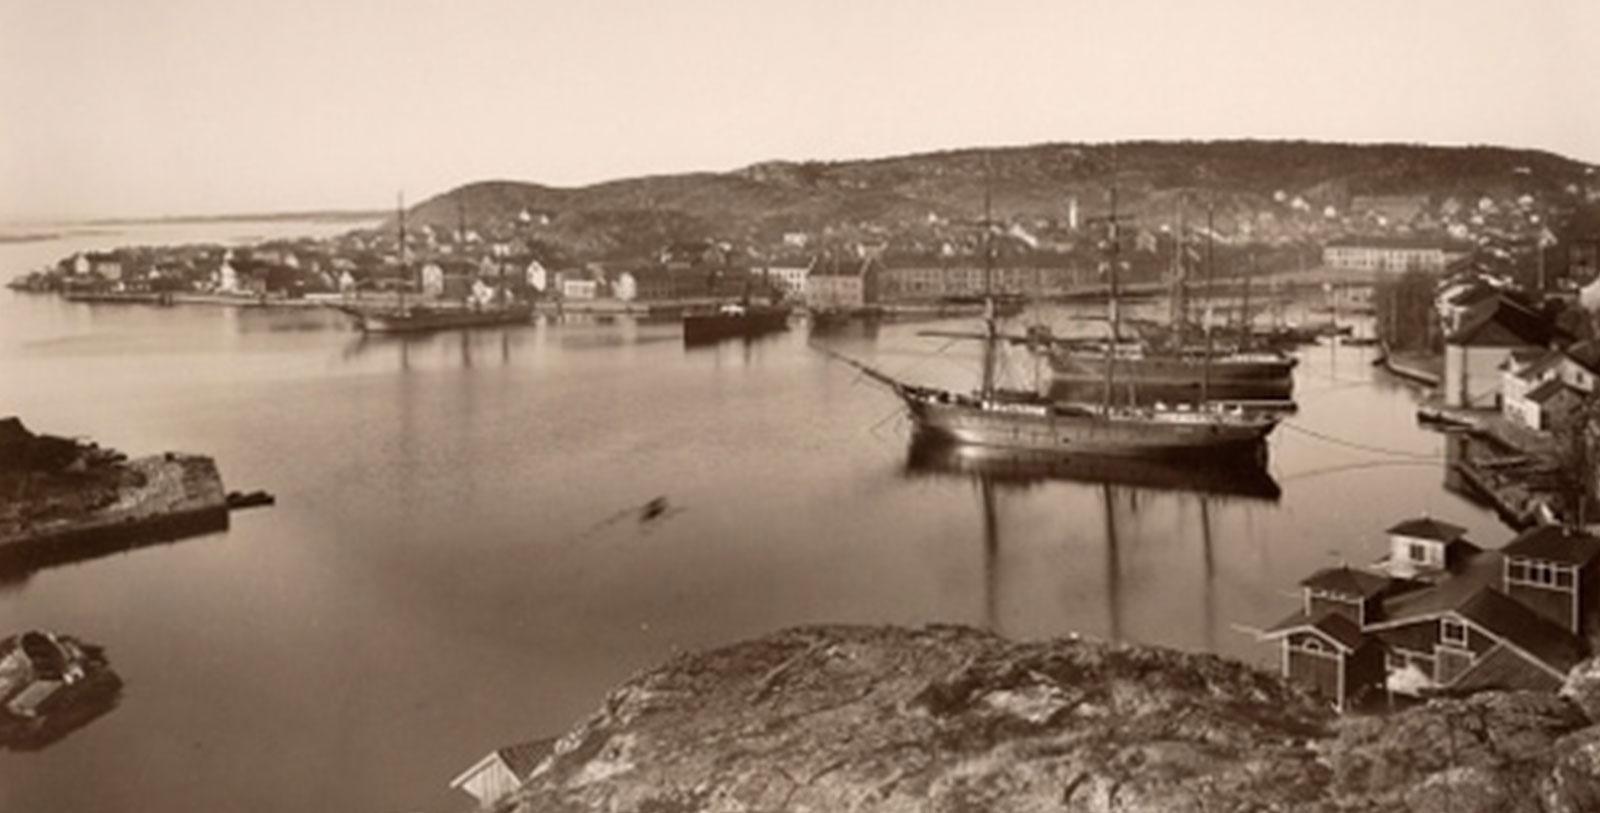 Image of Historic Risør Harbor, Det Lille Hotel, 1750, Member of Historic Hotels Worldwide, Risør, Norway, History